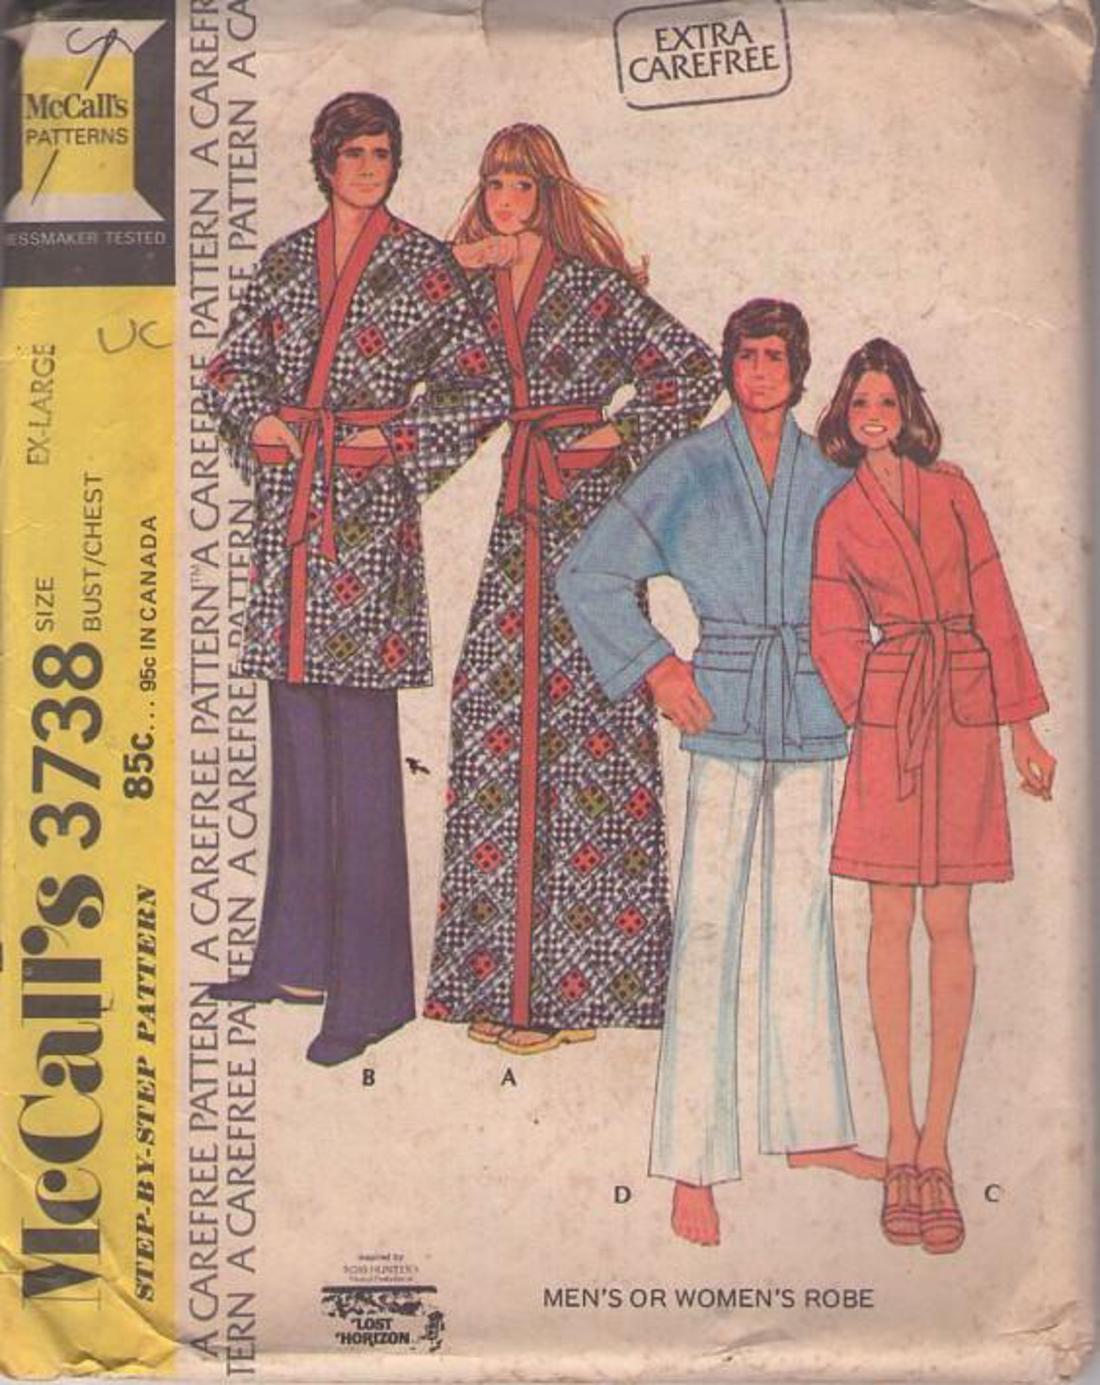 Momspatterns Vintage Sewing Patterns Mccall S 3738 Vintage 70 S Sewing Pattern Neat Extra Carefree Inspired By Ross Hunters Lost Horizon Wrap Around Kimono Robe Bathrobe Set Spa Robe For Men Women